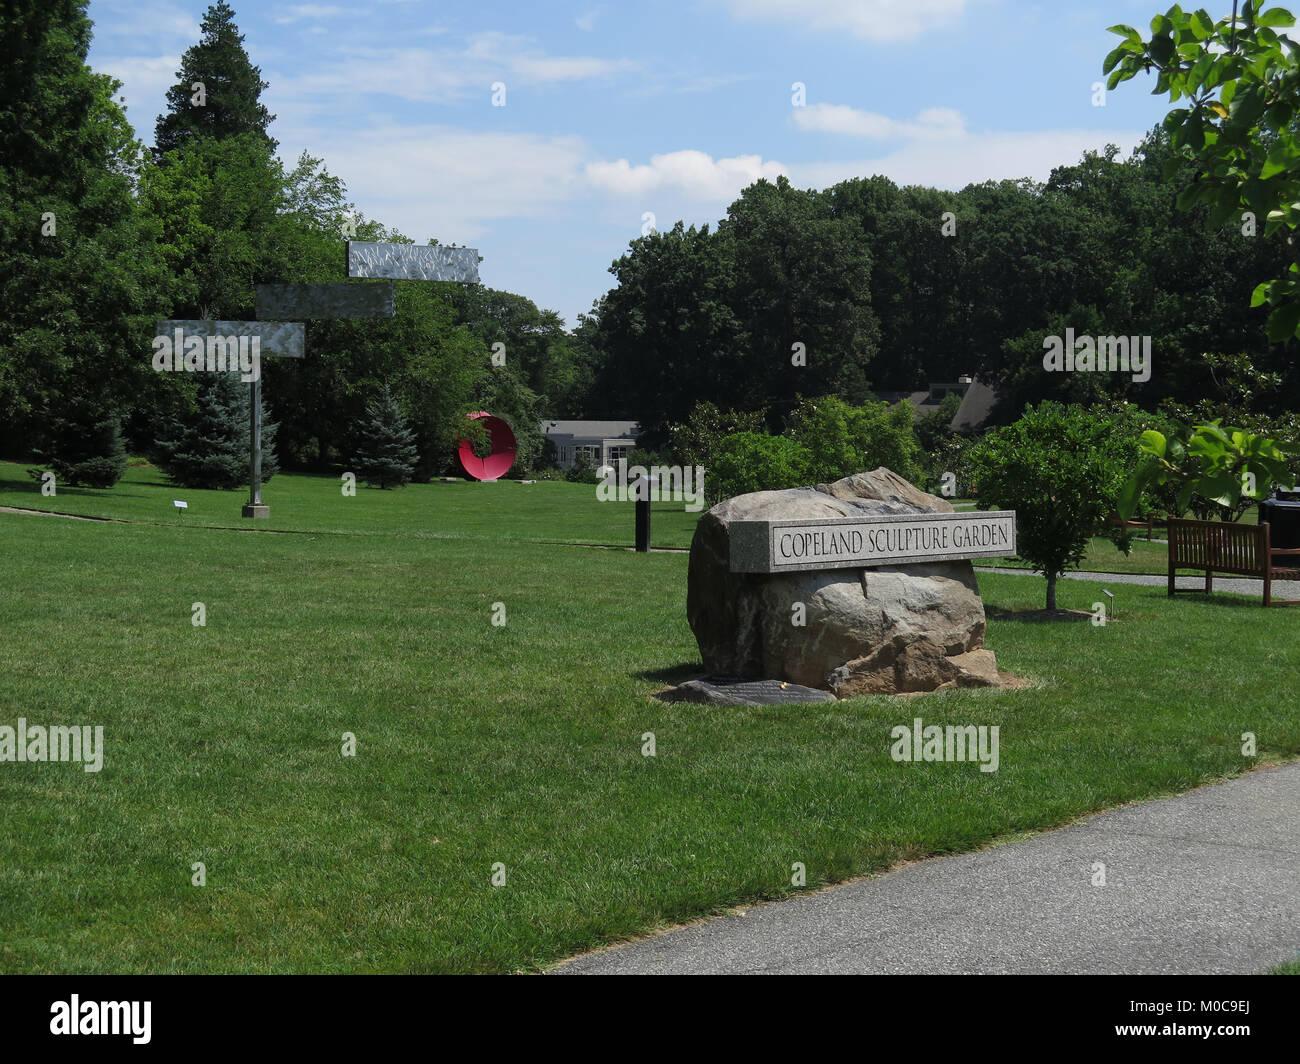 Delaware Art Museum, Wilmington, Delaware, Kunst, Skulptur, Park. Sculpture Garden, illustrative Kunst, Stockbild